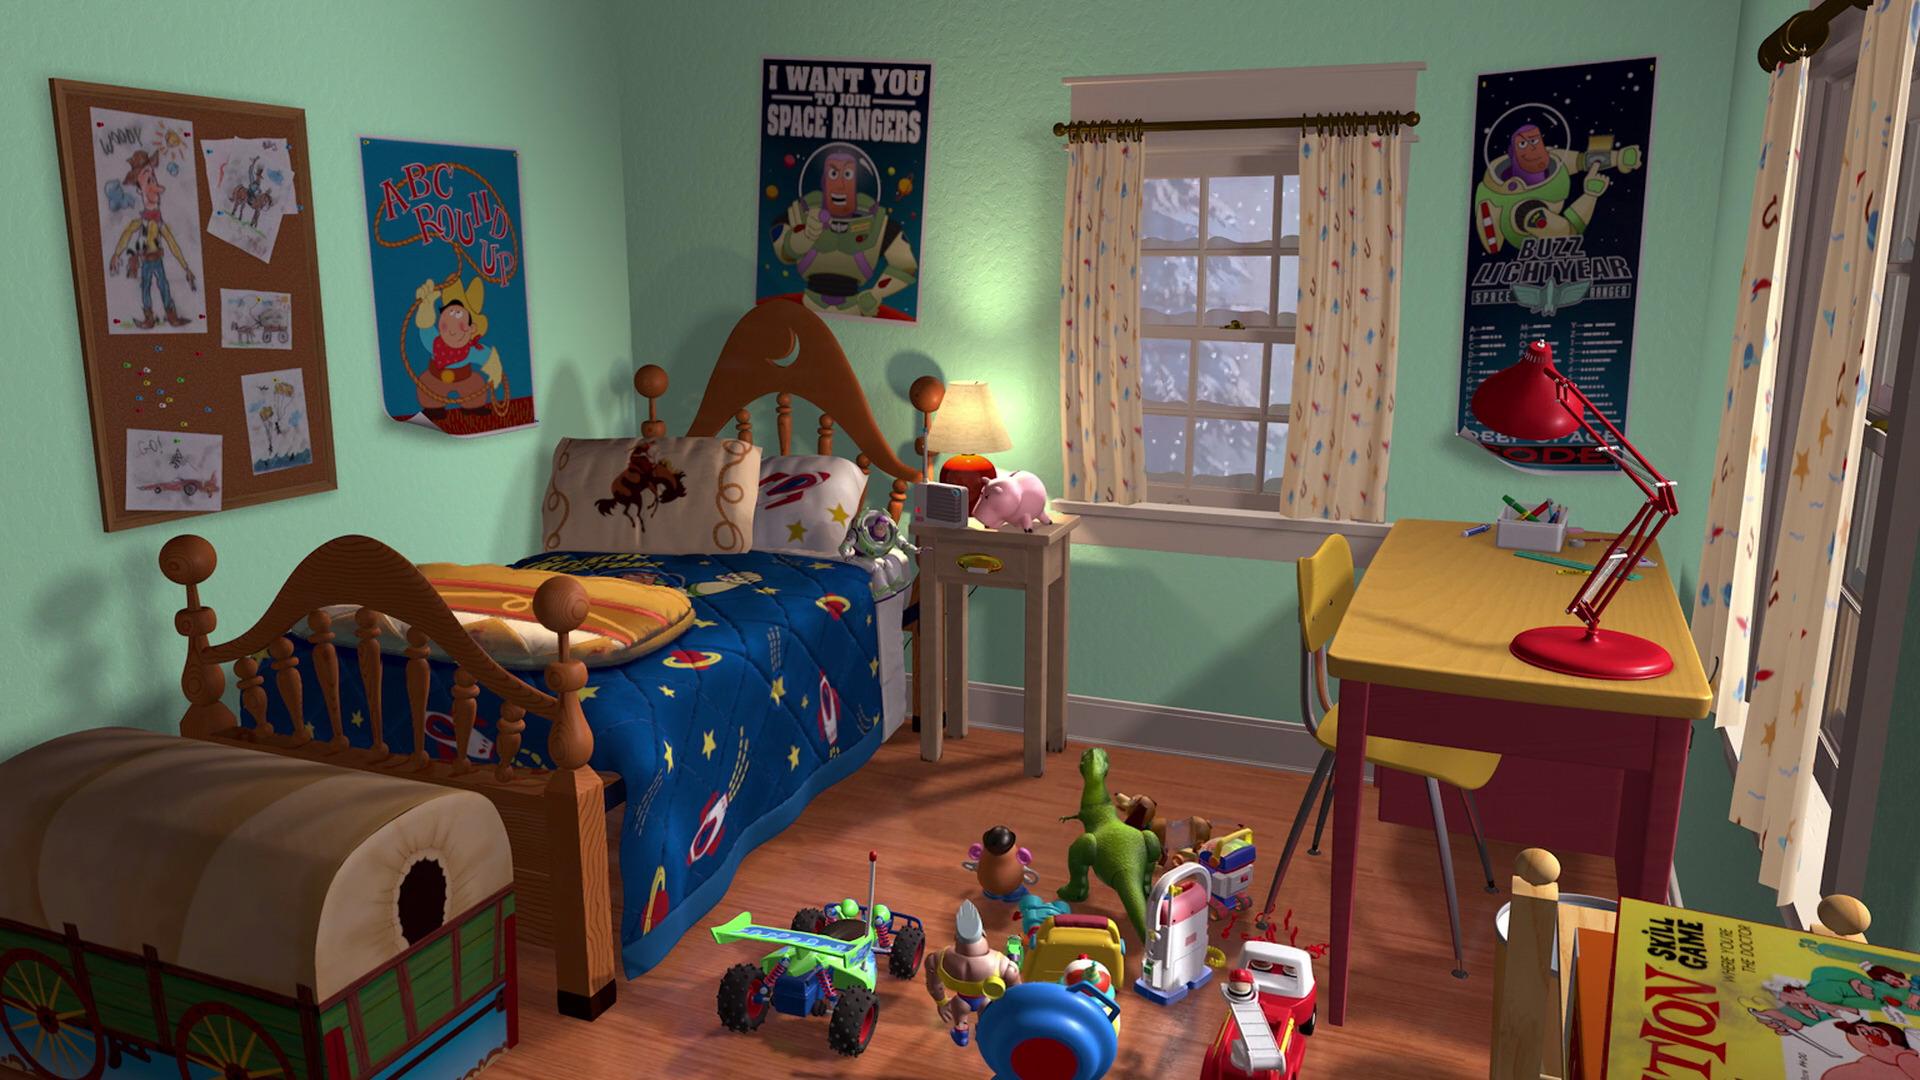 Image AndysNewRoomjpg Pixar Wiki FANDOM Powered By